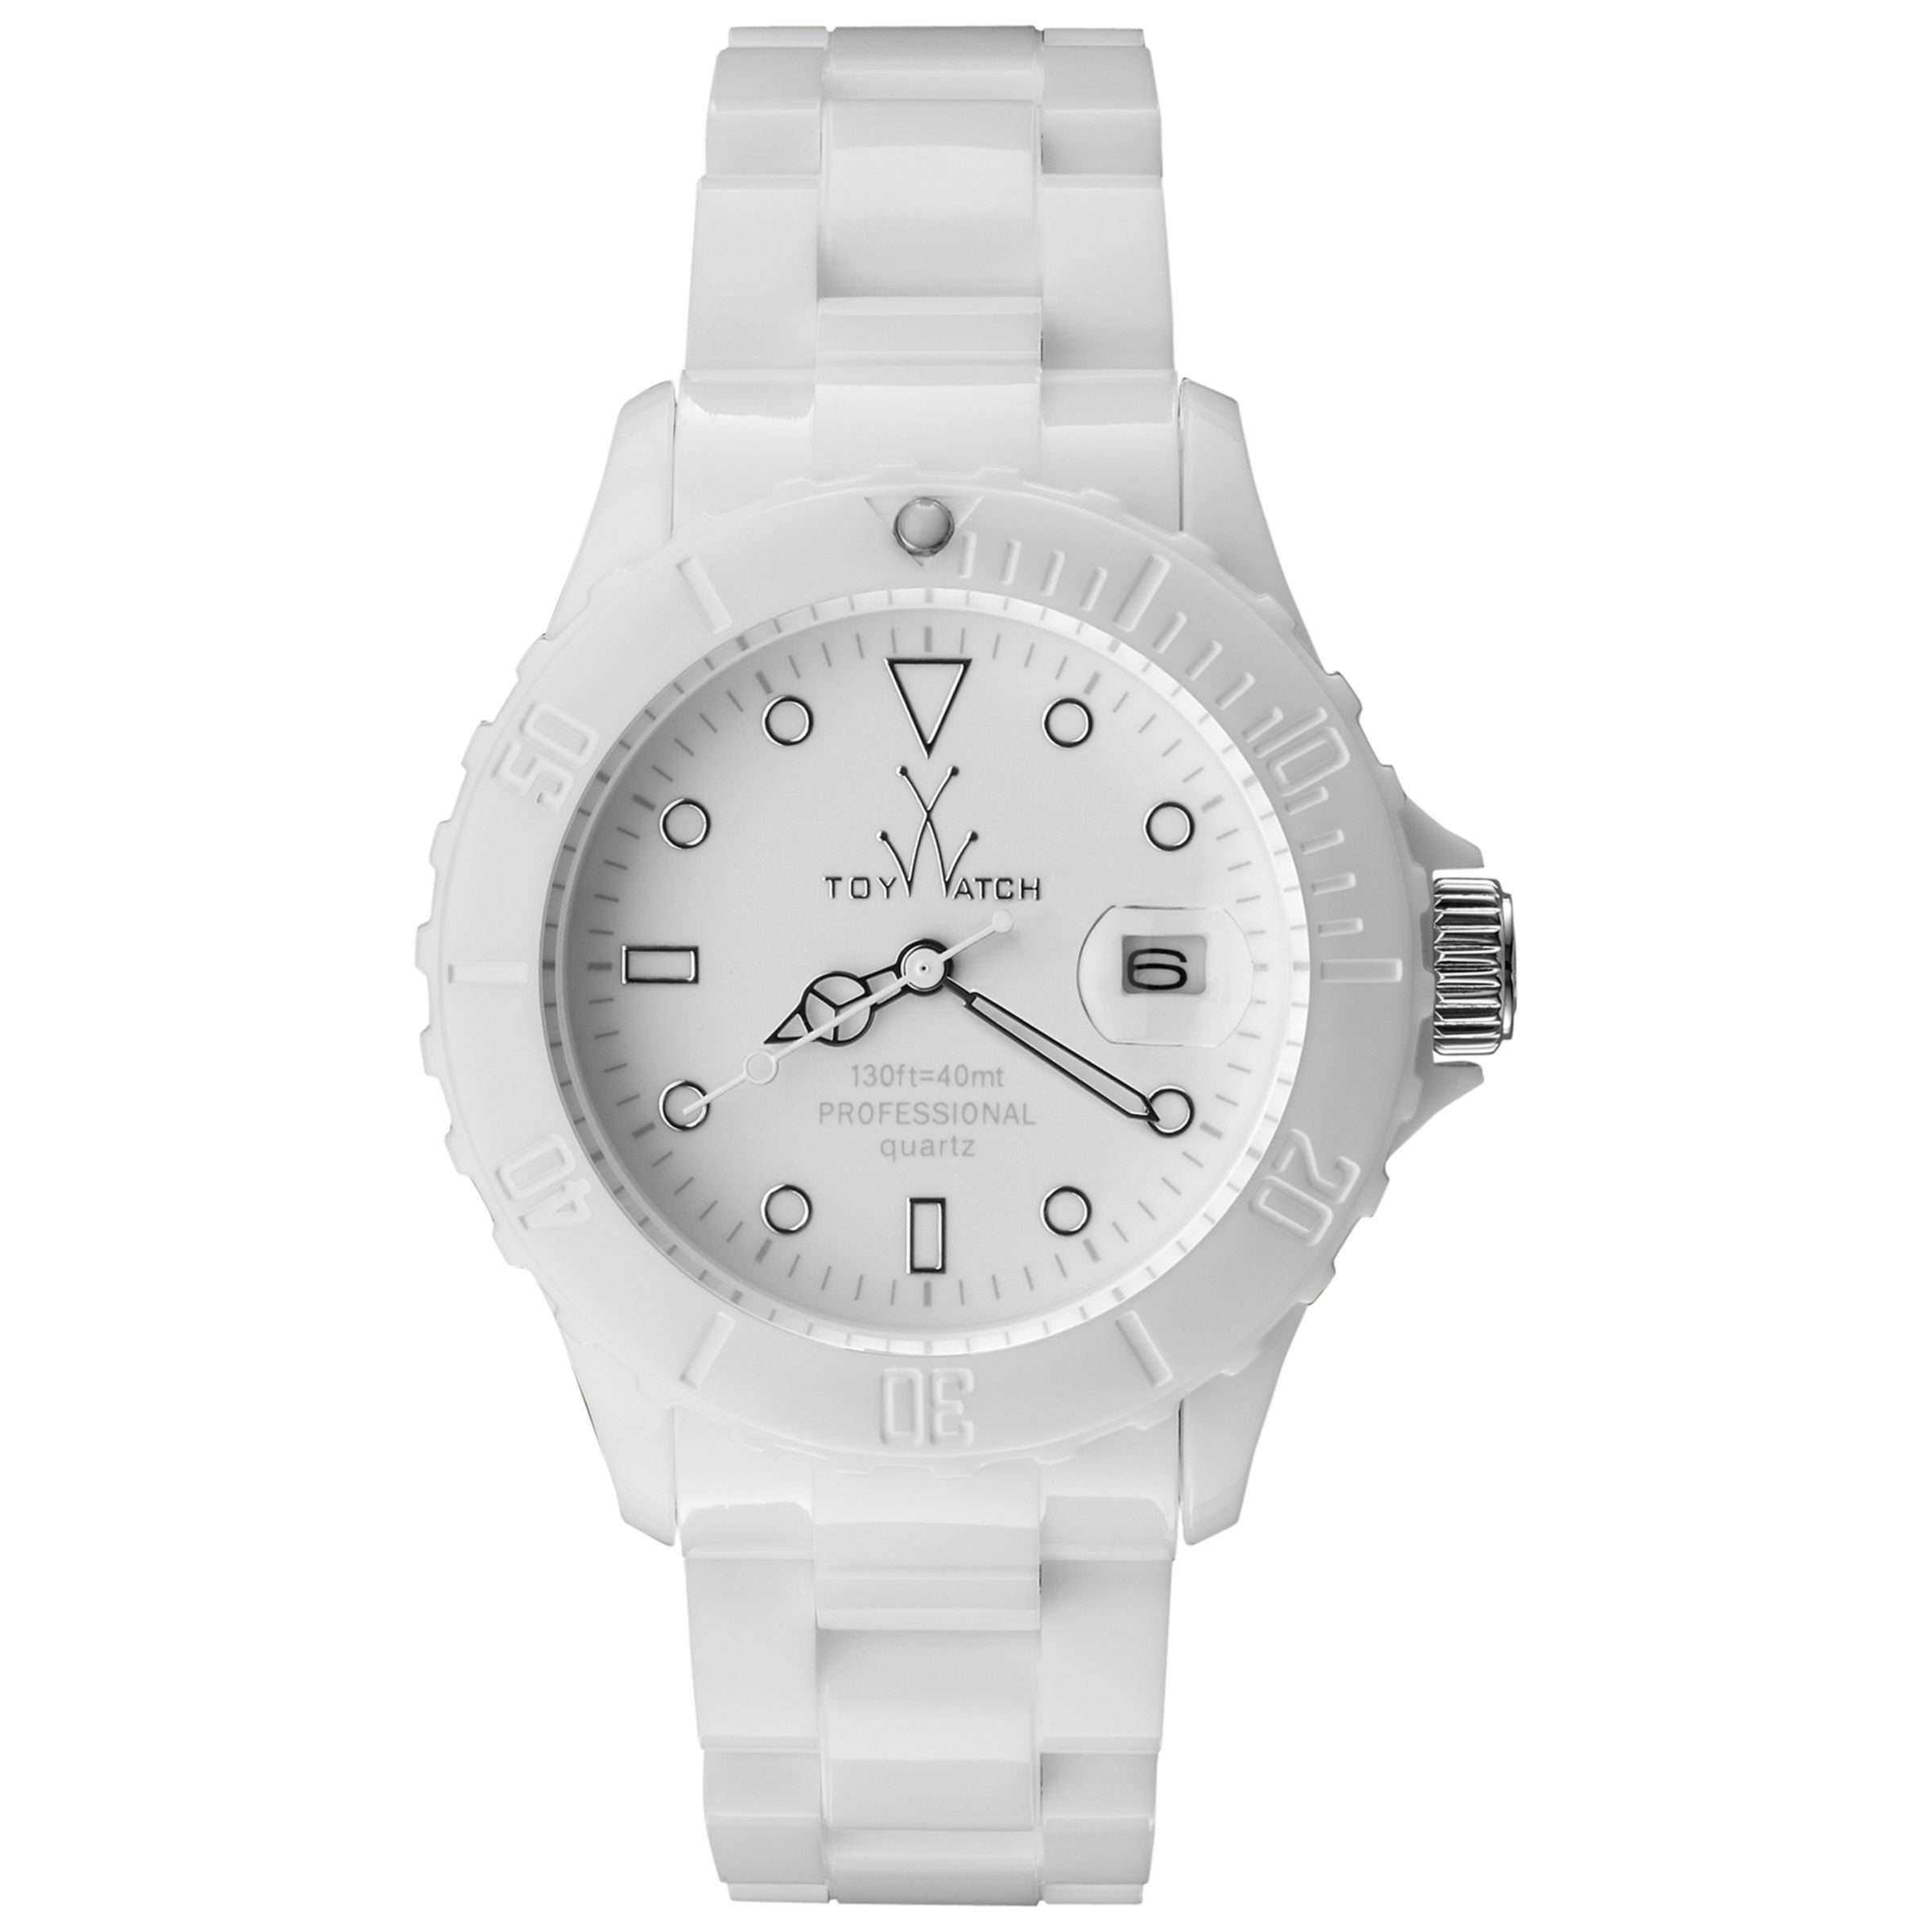 Toy Watch MO01WH Unisex Monochrome White Bracelet Watch, White